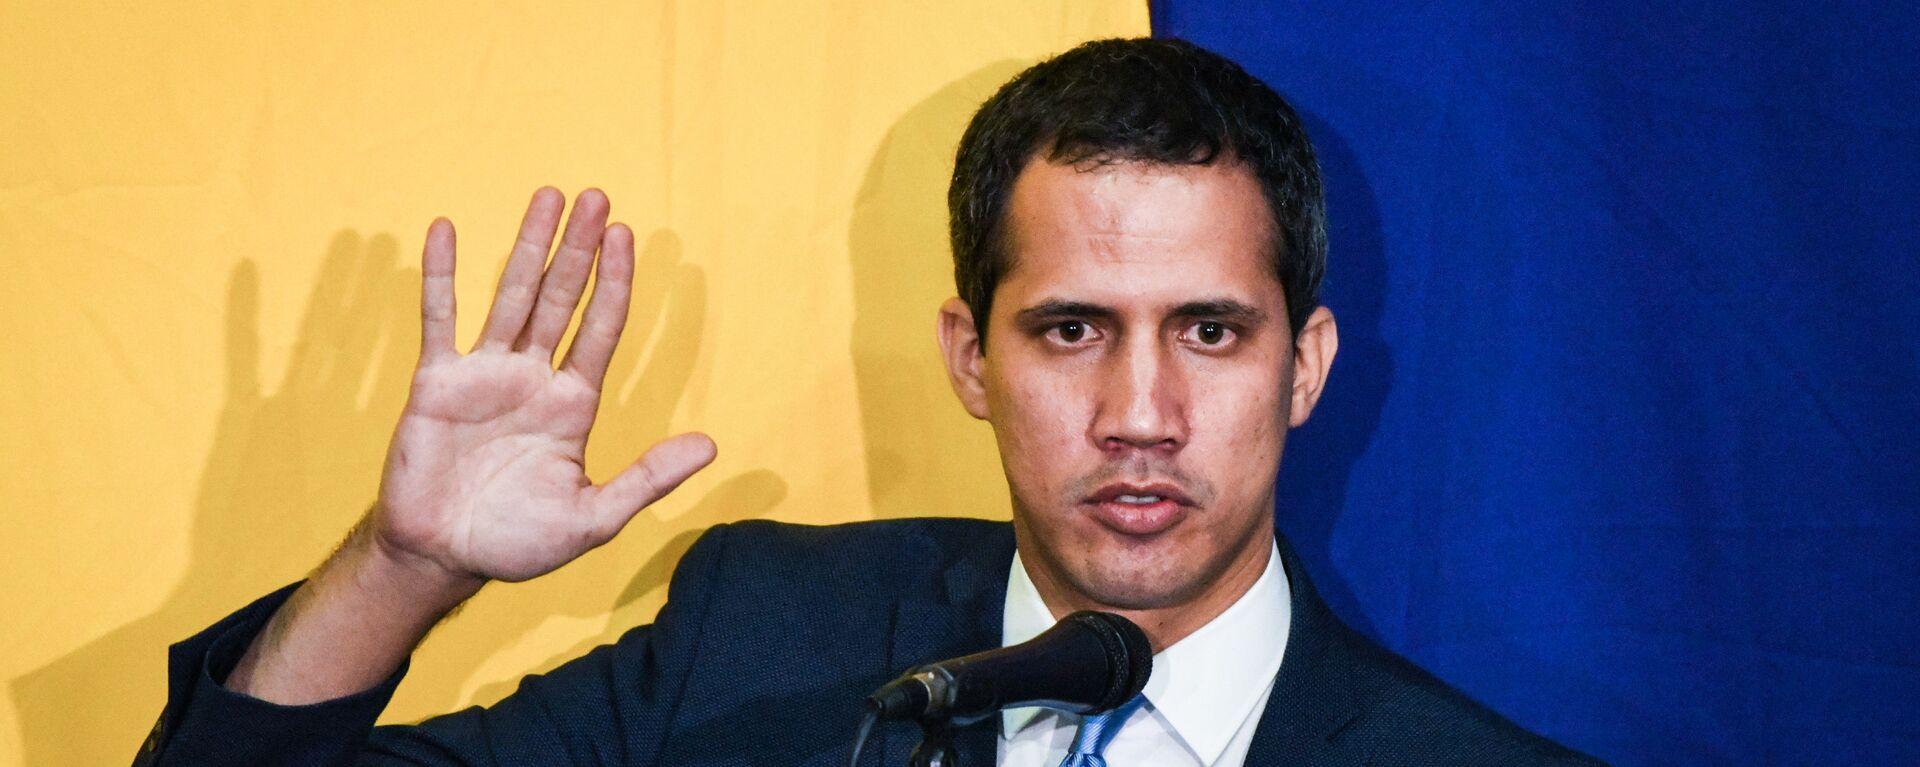 Juan Guaidó, dirigente opositor venezolano - Sputnik Mundo, 1920, 20.07.2021